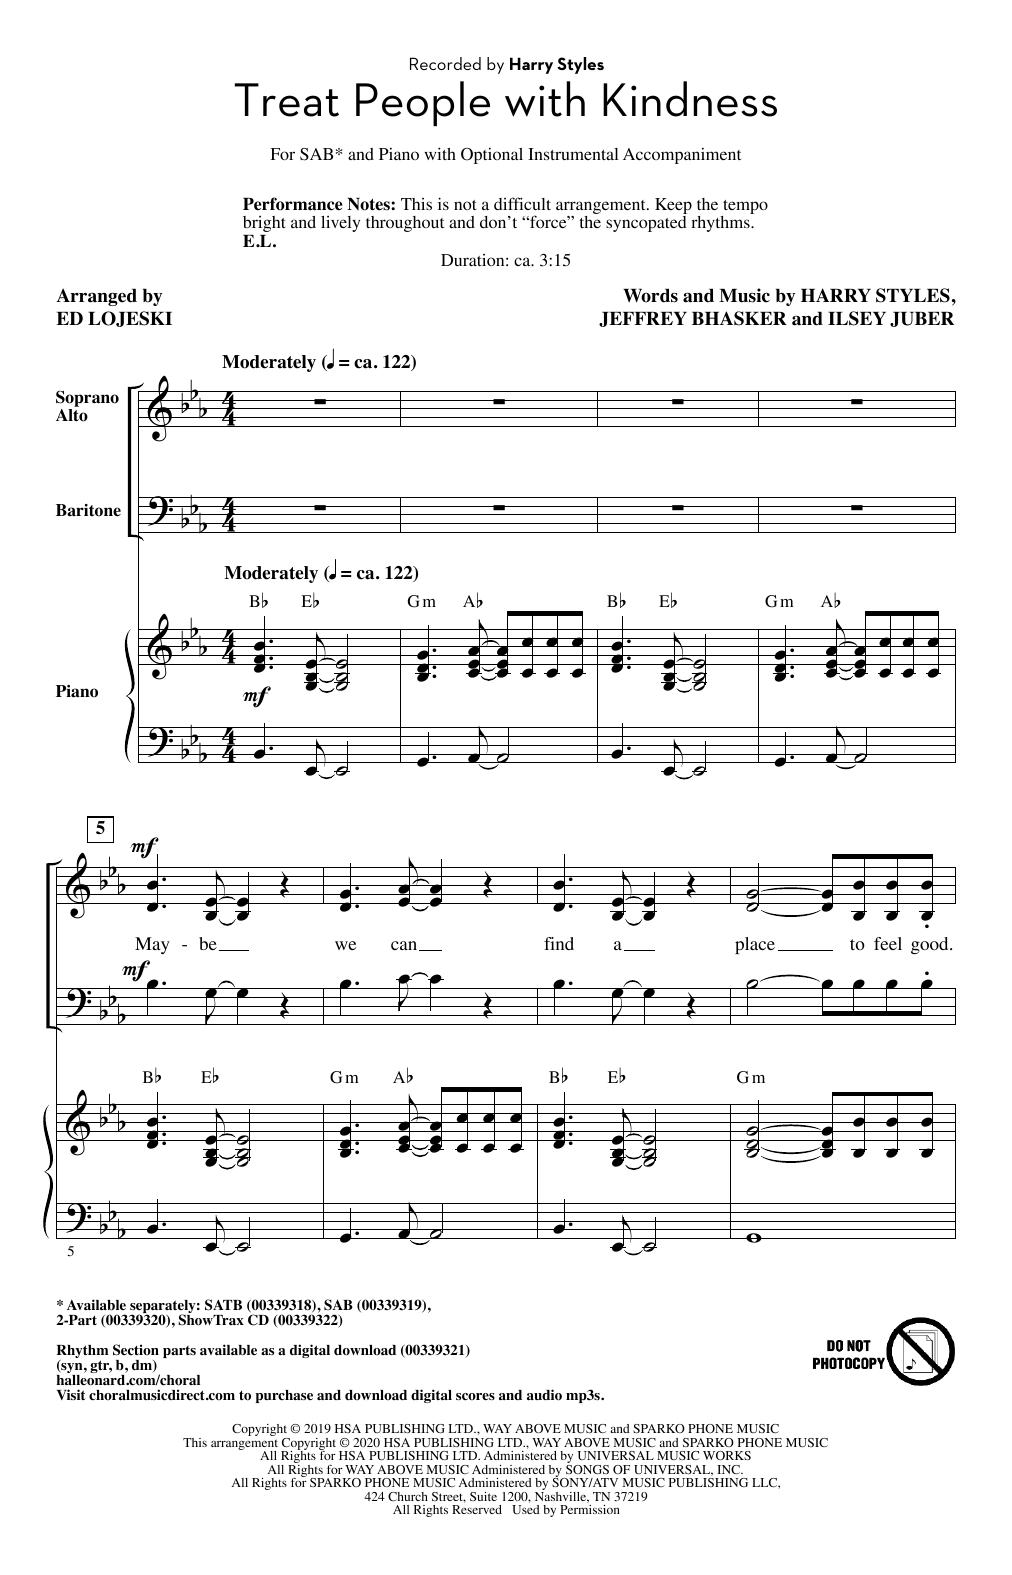 Treat People With Kindness (arr. Ed Lojeski) Sheet Music